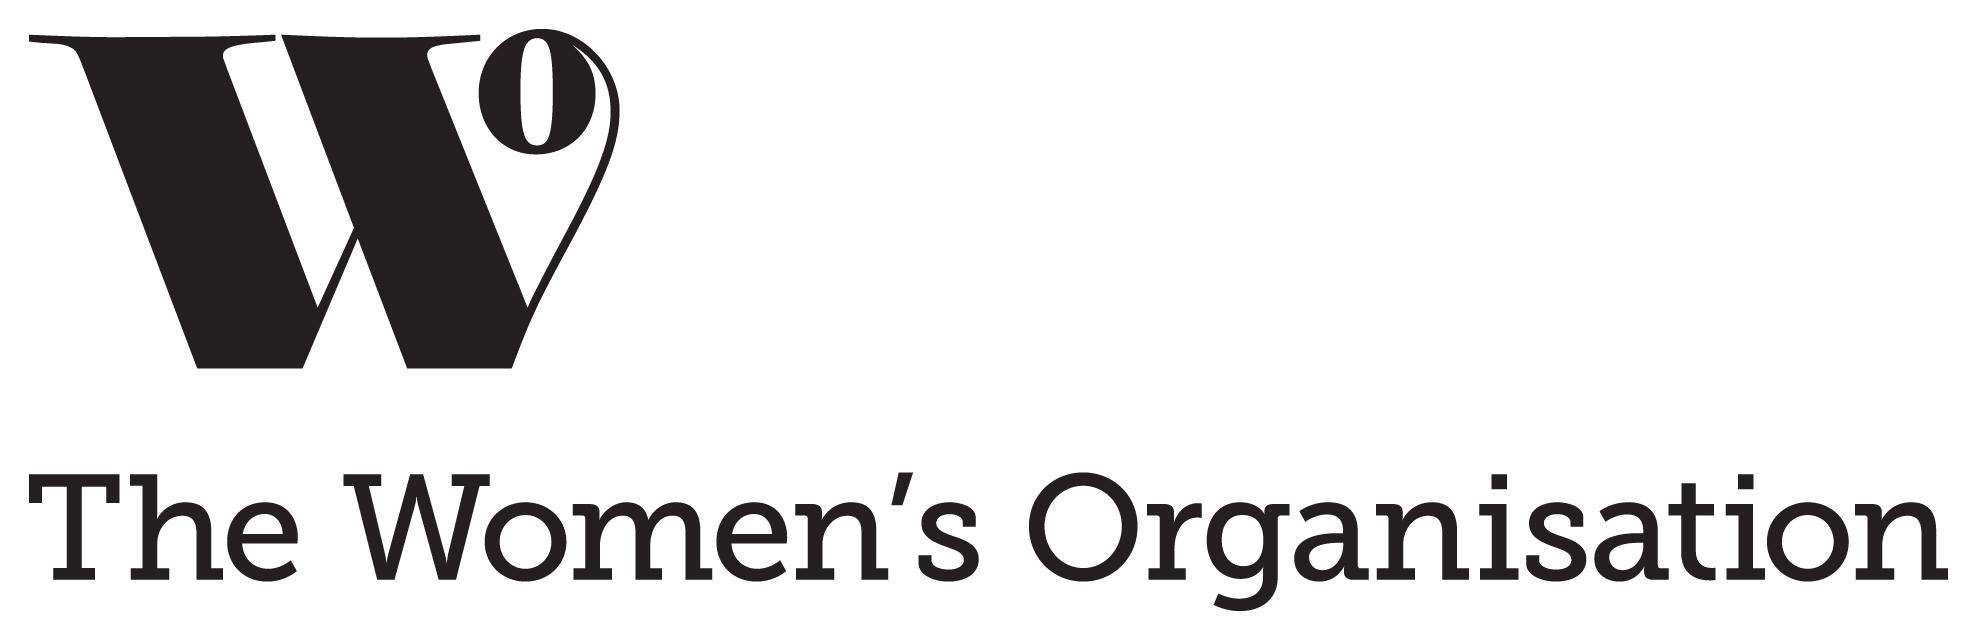 The-Womens-Organisation-logo-black